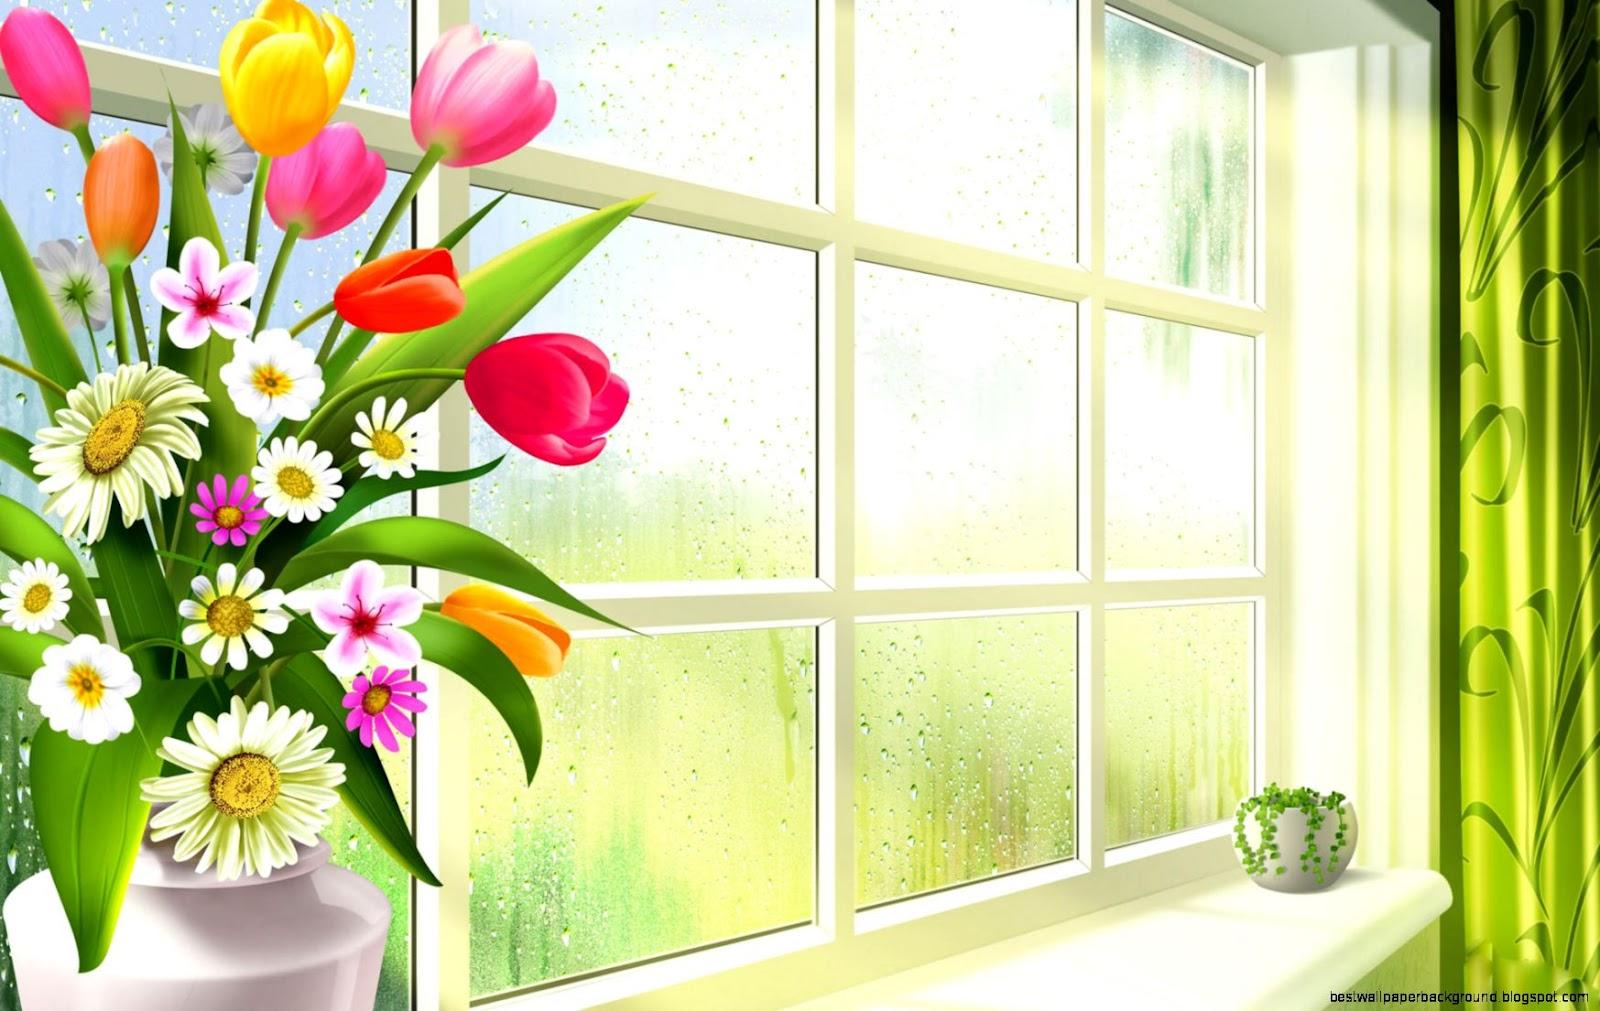 Spring Desktop Backgrounds Wallpaper Best Wallpaper Background